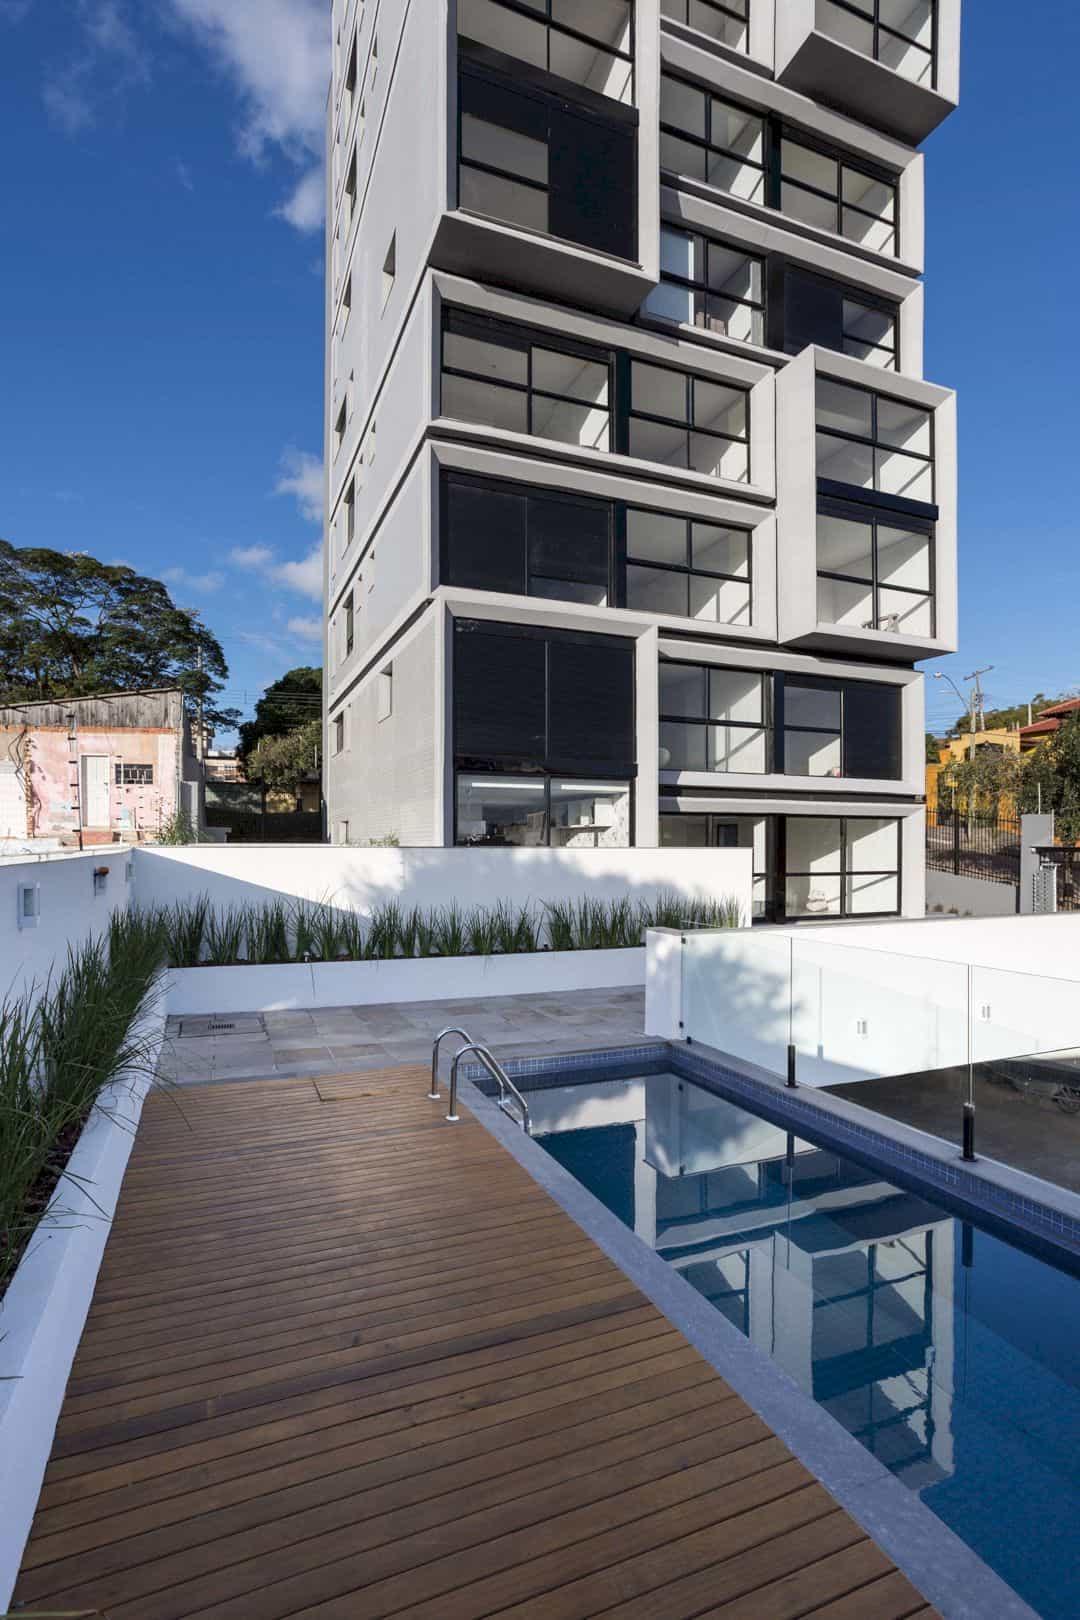 Fernando Abbott 866 A High Rise Residential Building In Porto Alegre 10